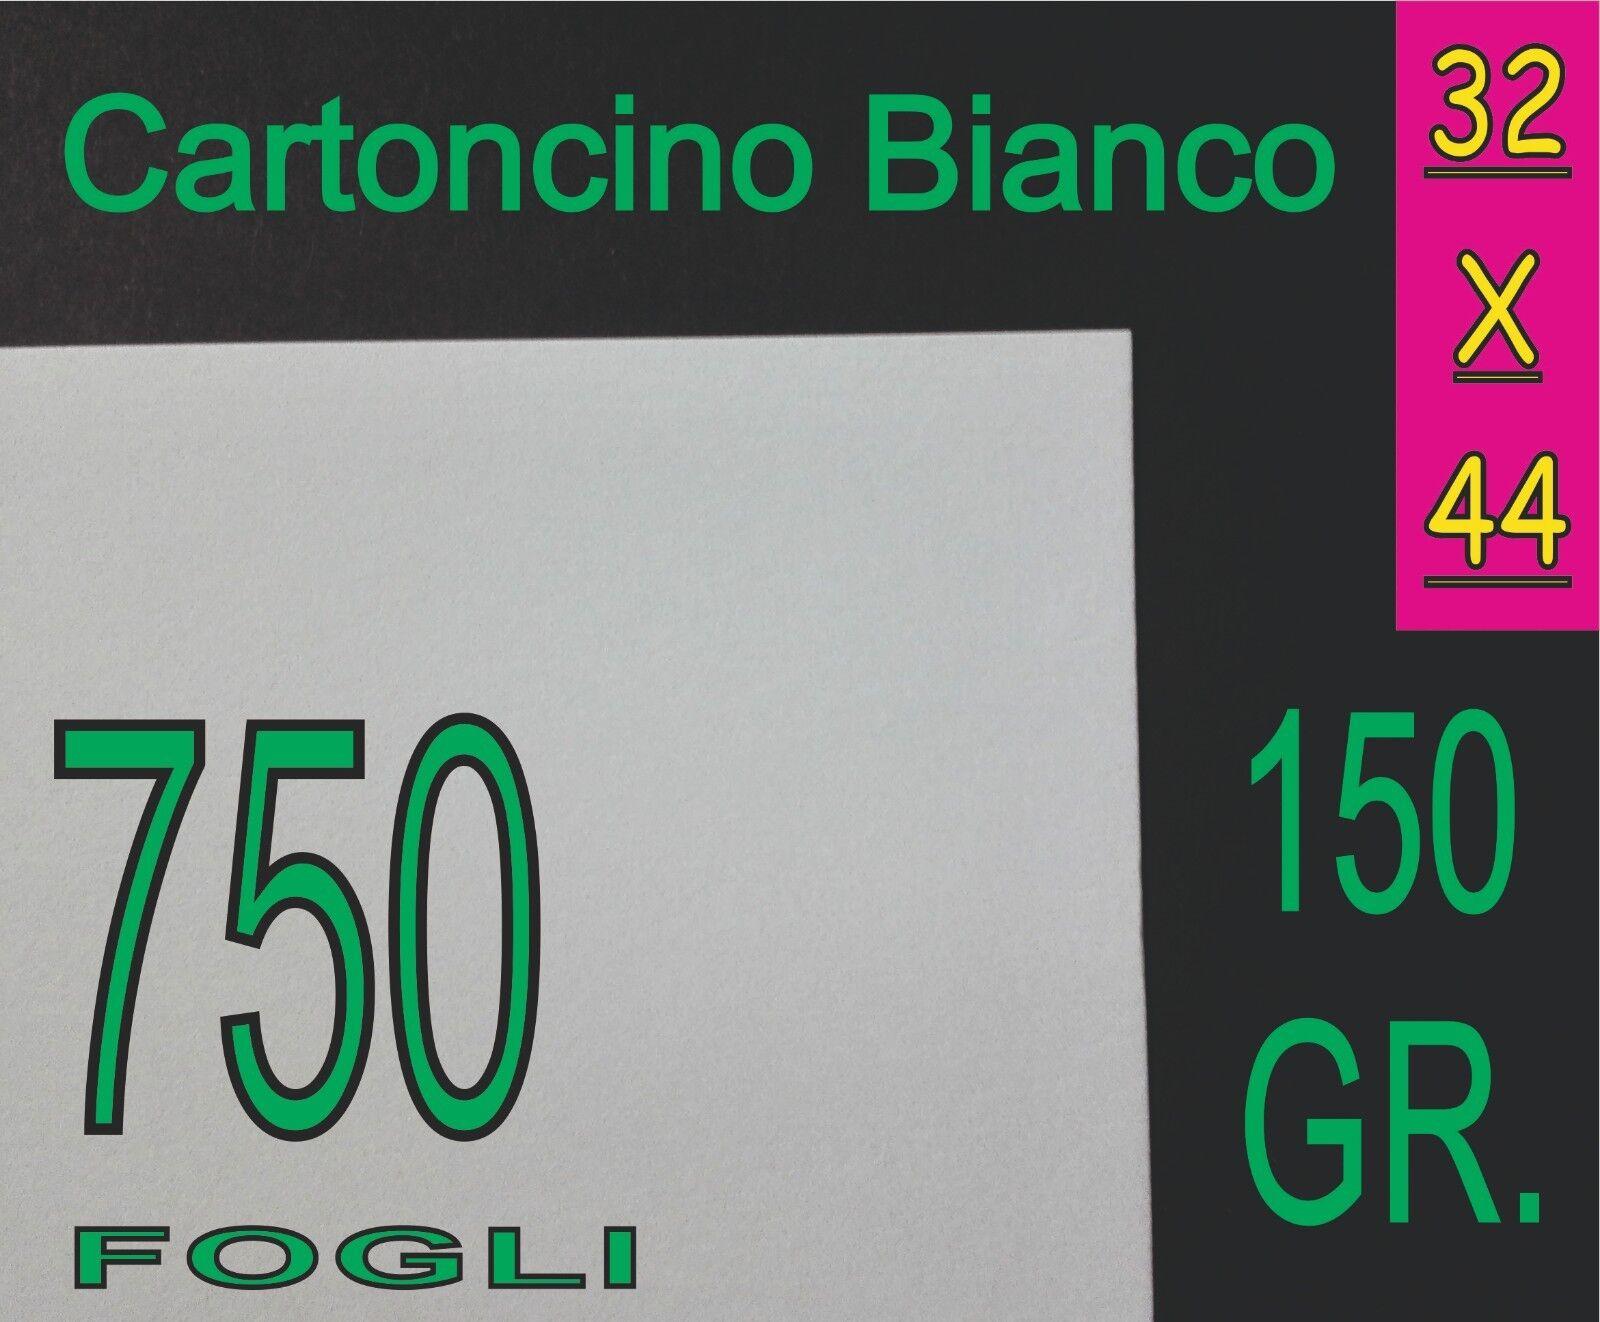 750 FOGLI CARTA CARTONCINO BIANCO OPACO STAMPANTI LASER 150G A3+ A3 PLUS 32X44CM